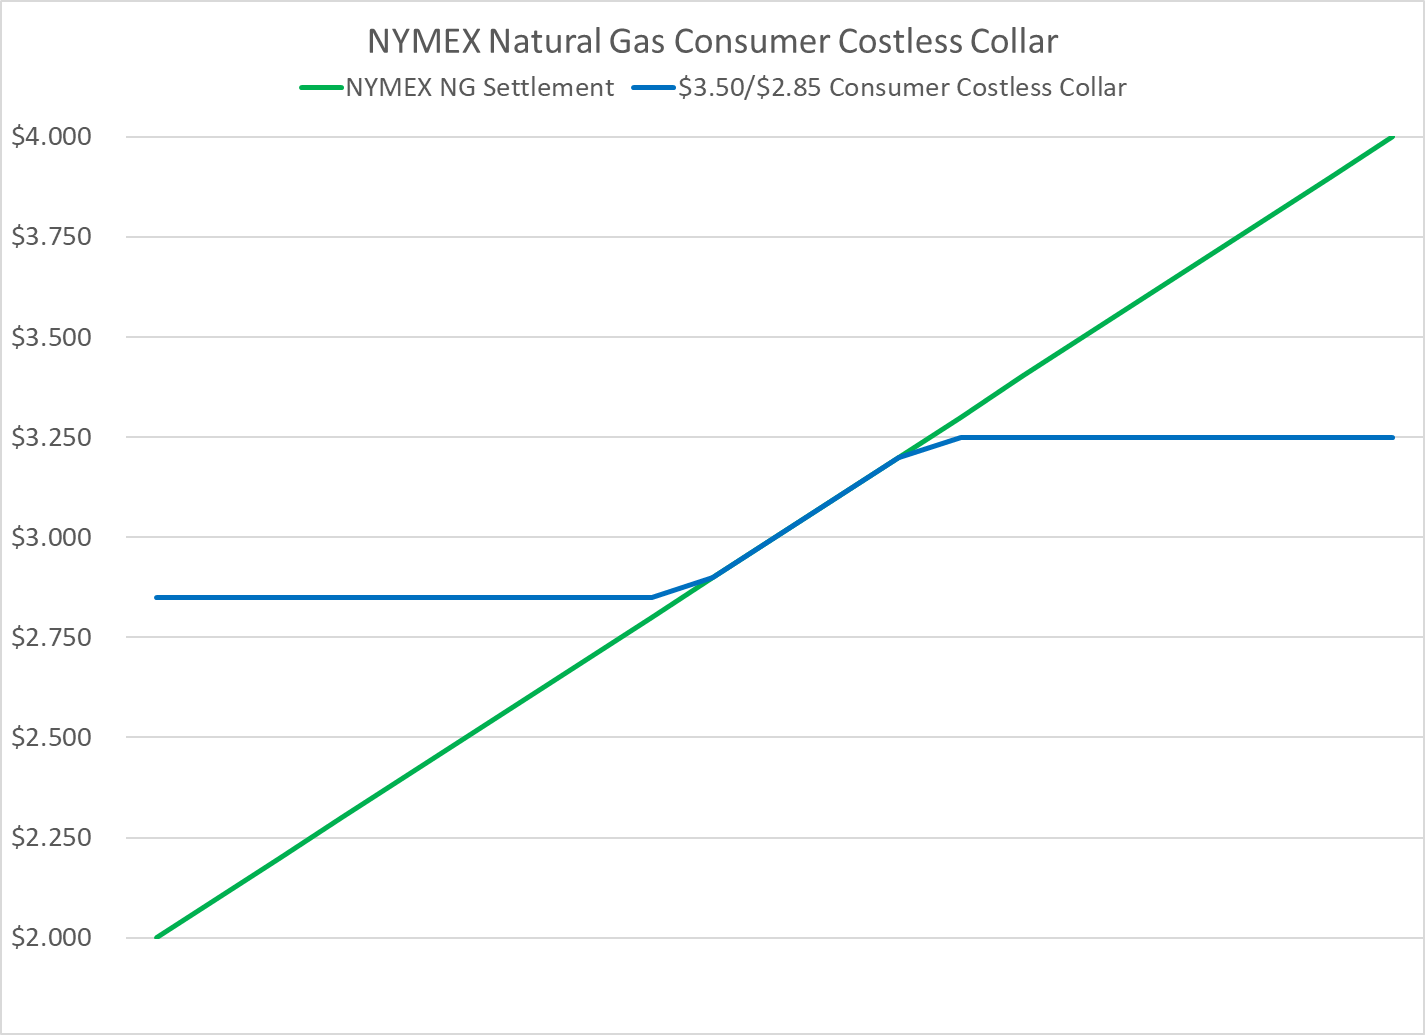 NYMEX-natural-gas-costless-collar-example